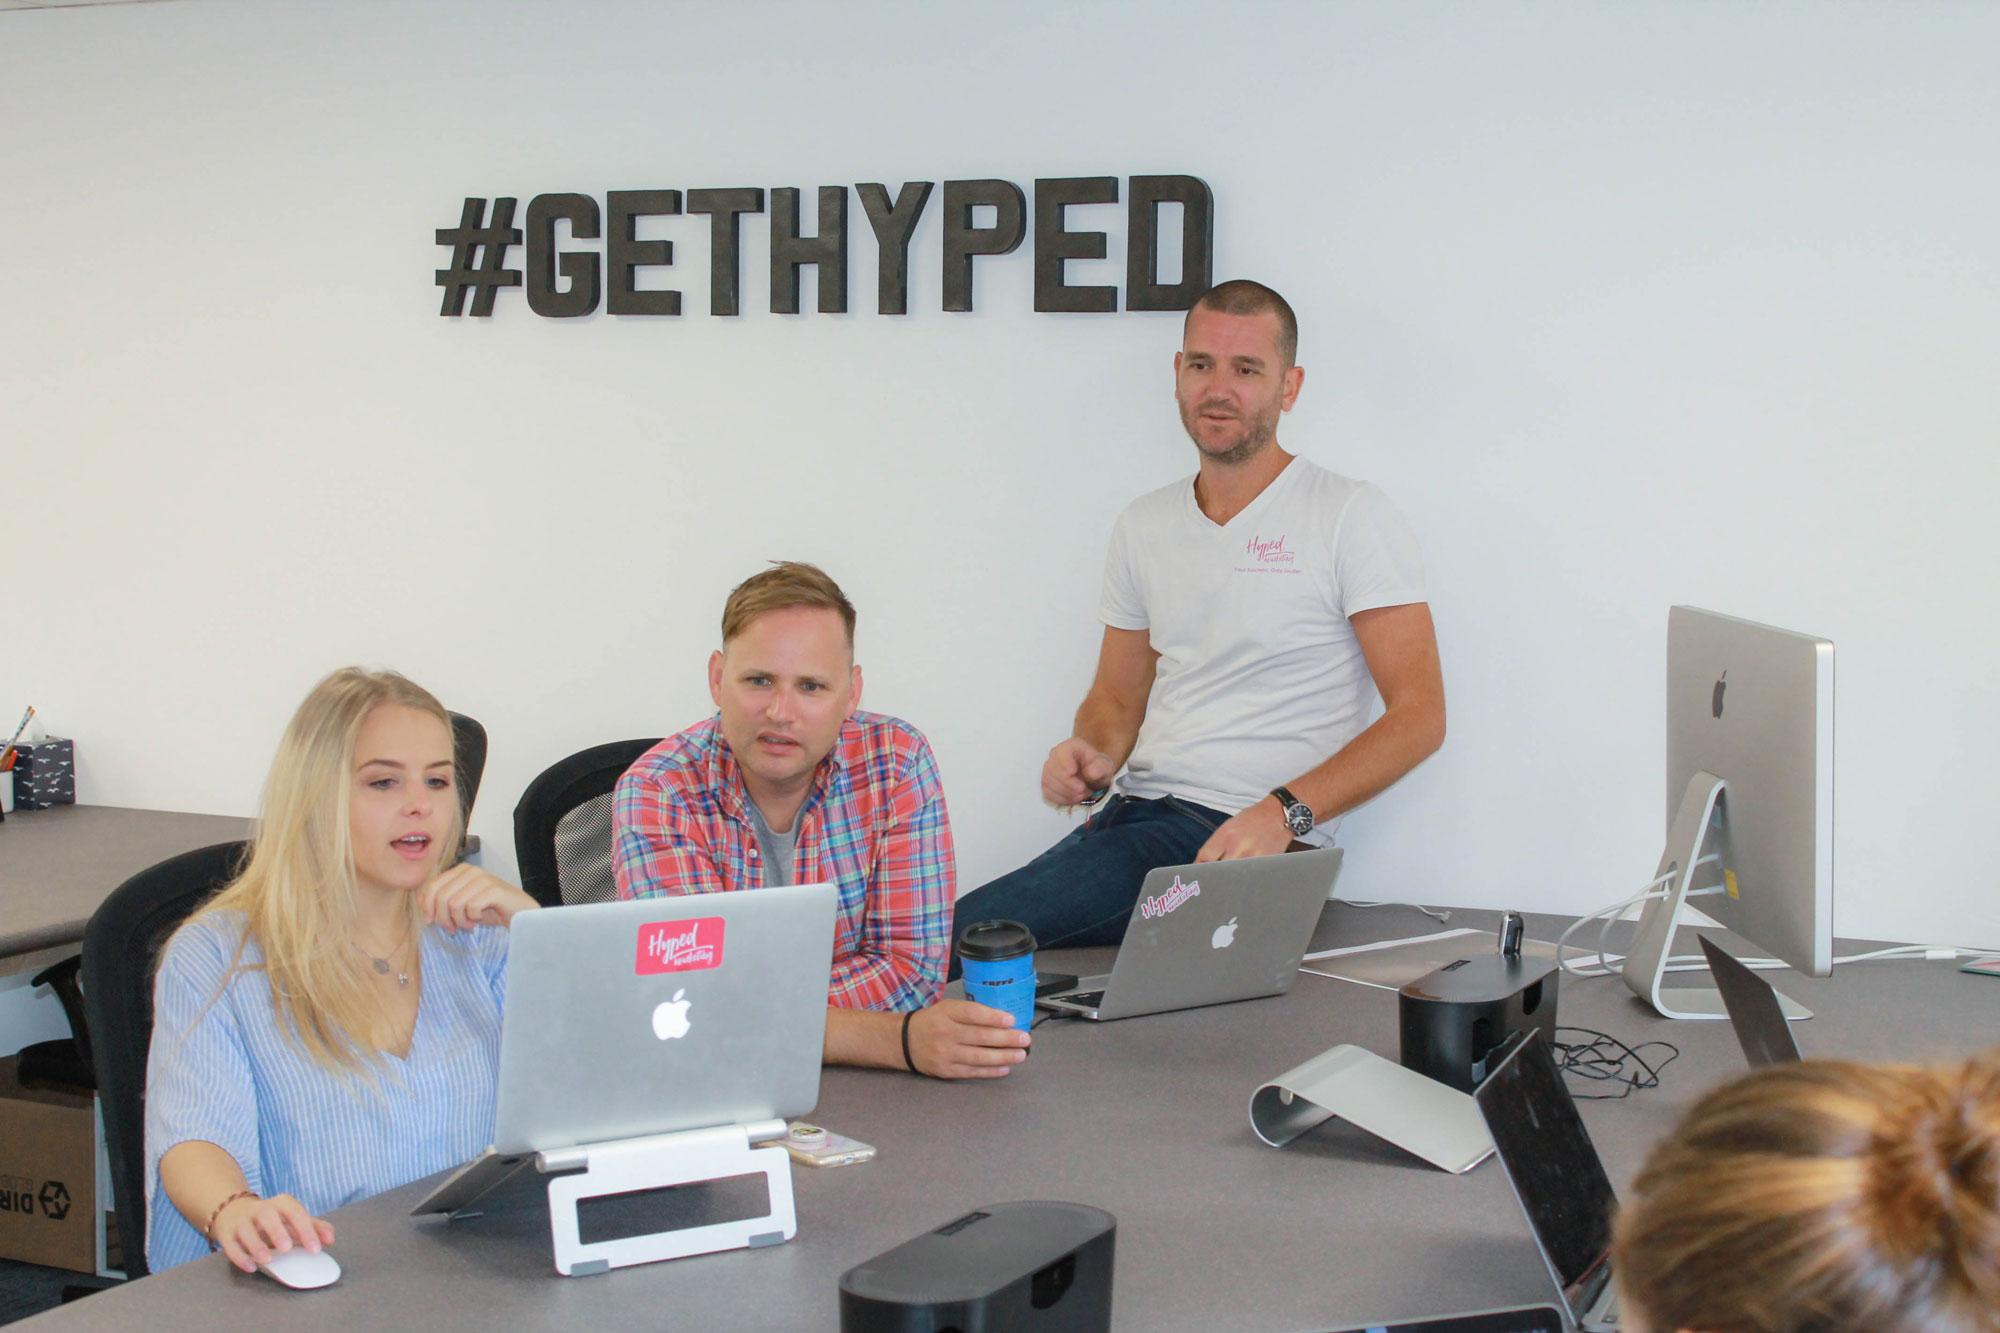 Hyped Marketing Team